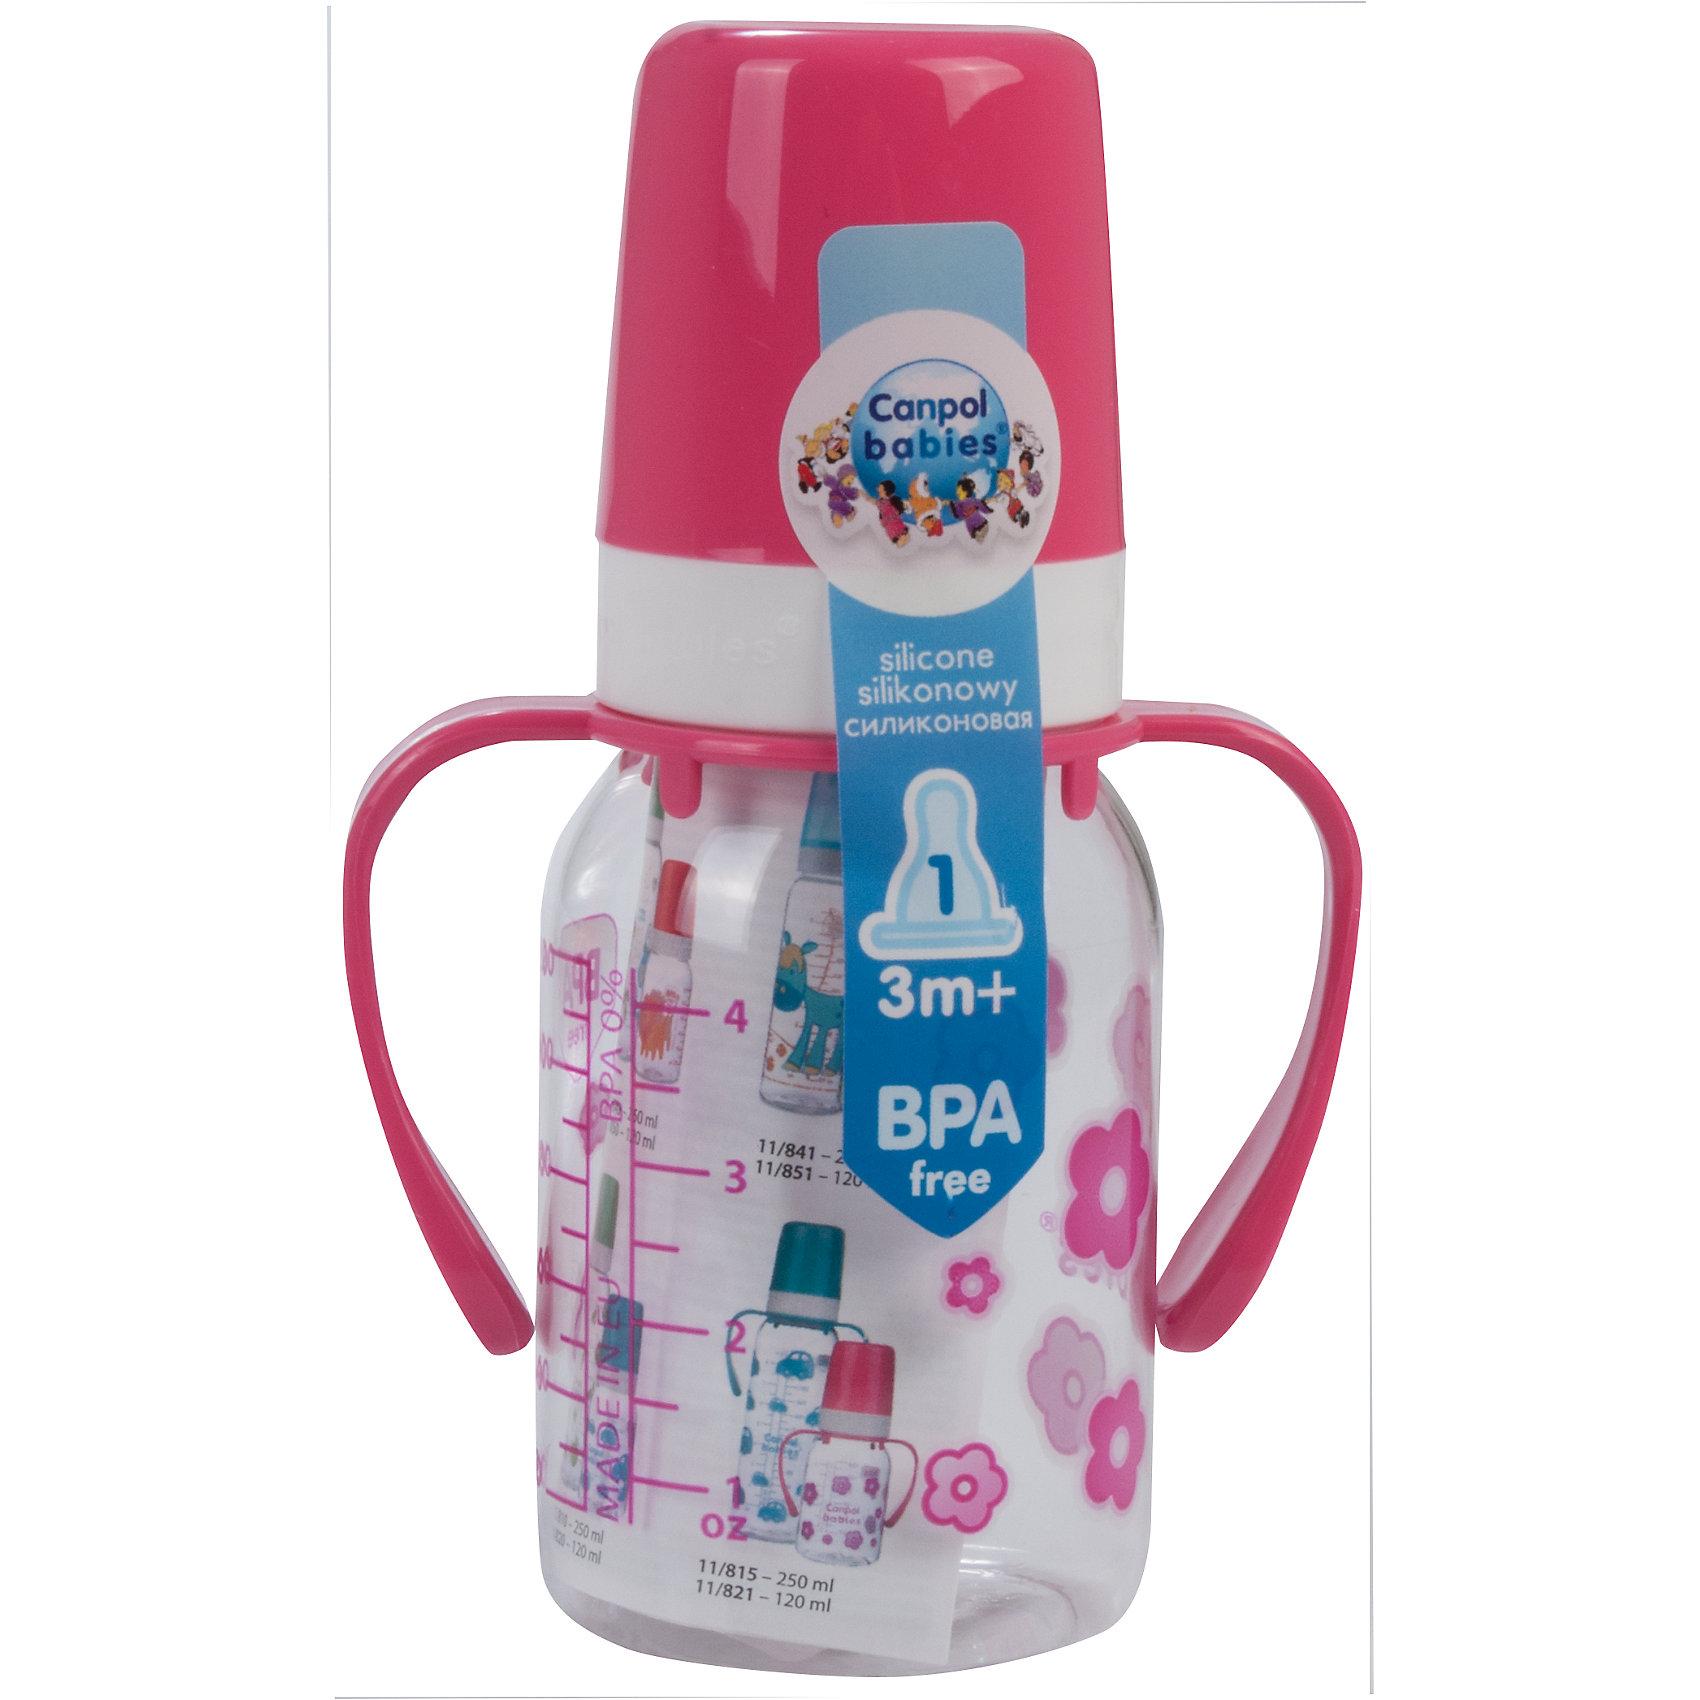 Canpol Babies Бутылочка тритановая 120 мл. 3+, Canpol Babies, розовый canpol babies канпол бутылочка пластиковая фигурная 250мл